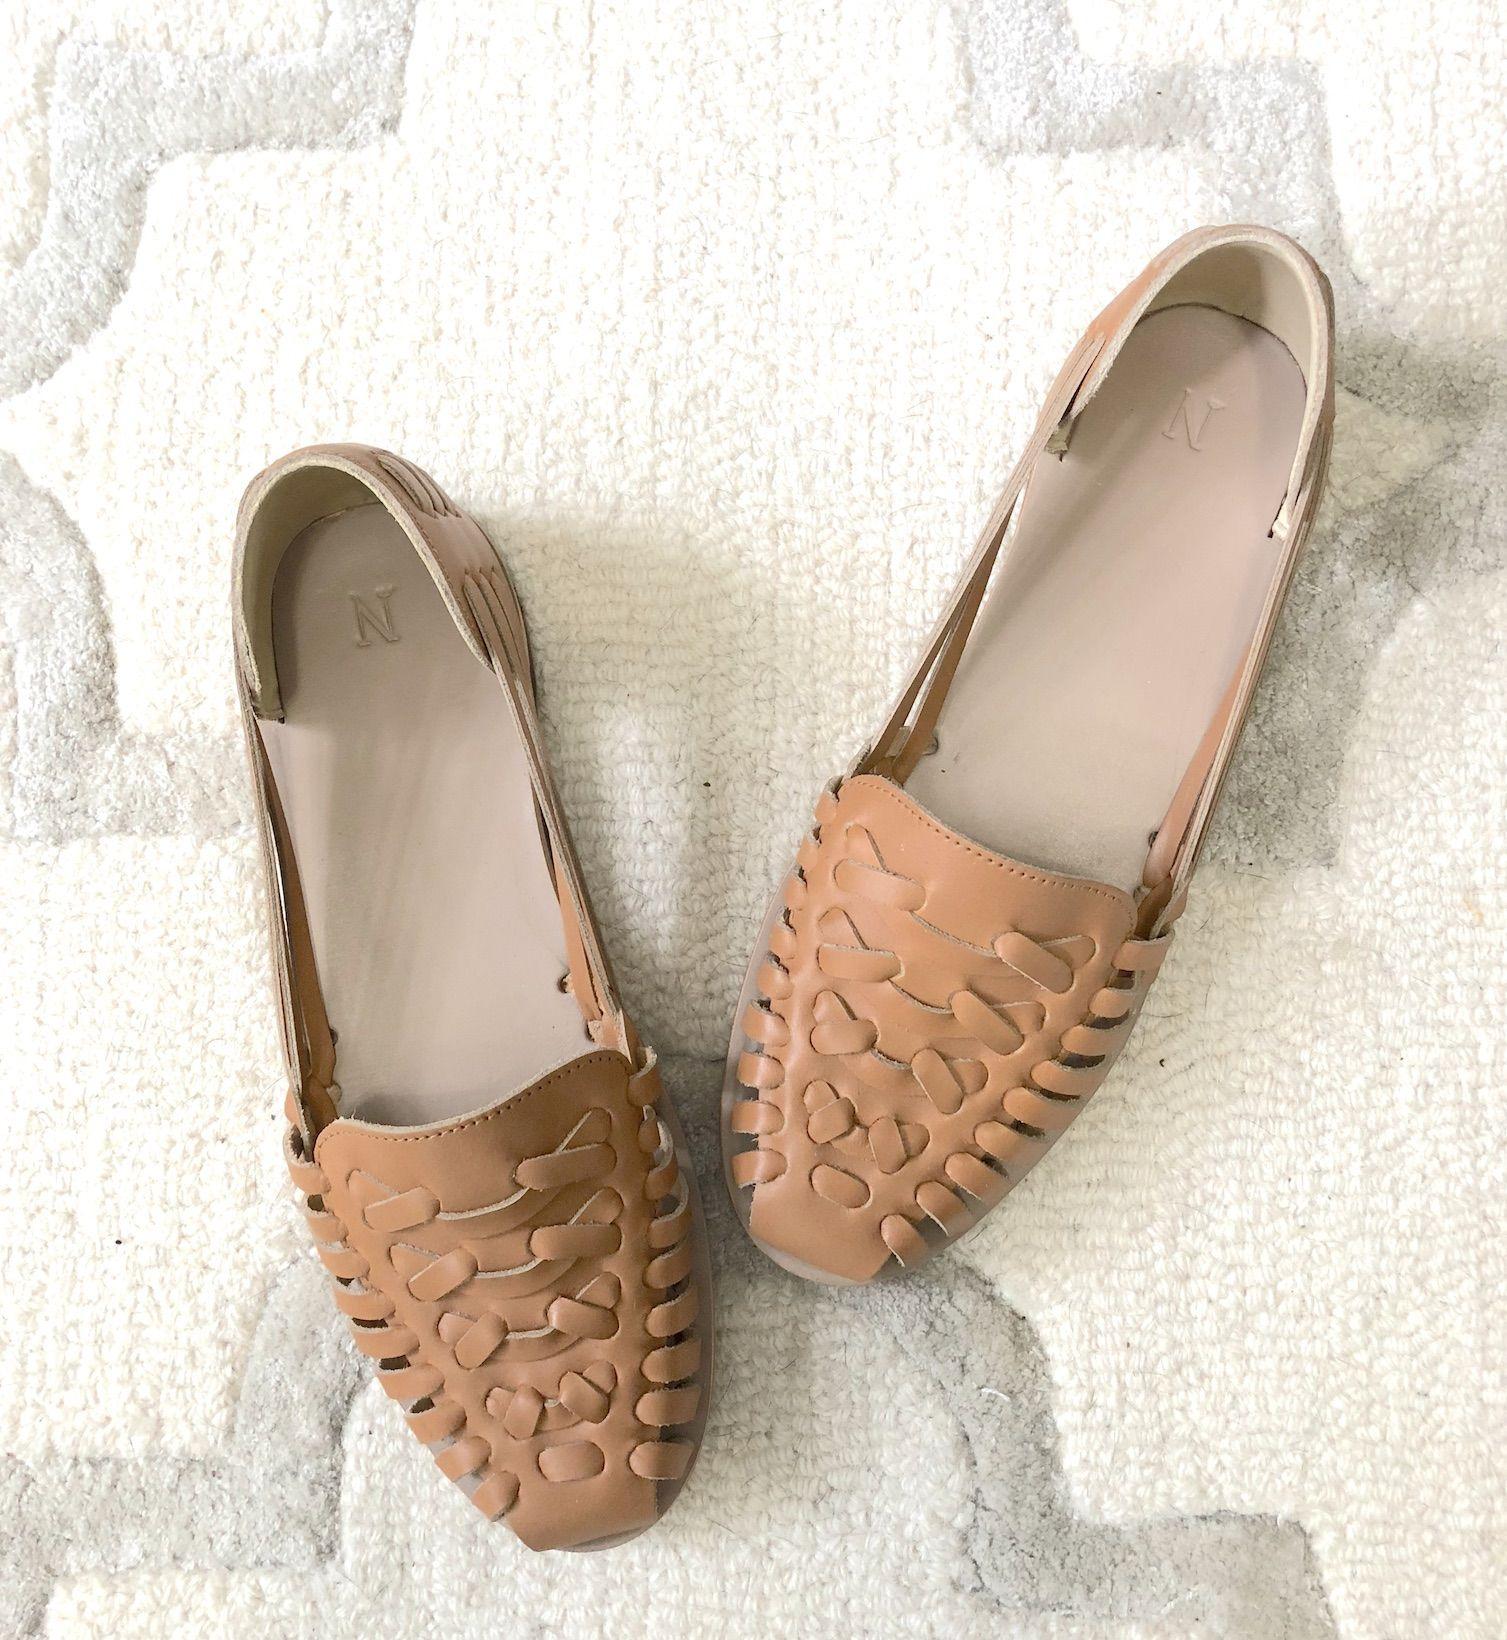 e9a9fac8b4e7 My Favorite Summer Shoes - Nisolo Ecuador Huarache Sandal